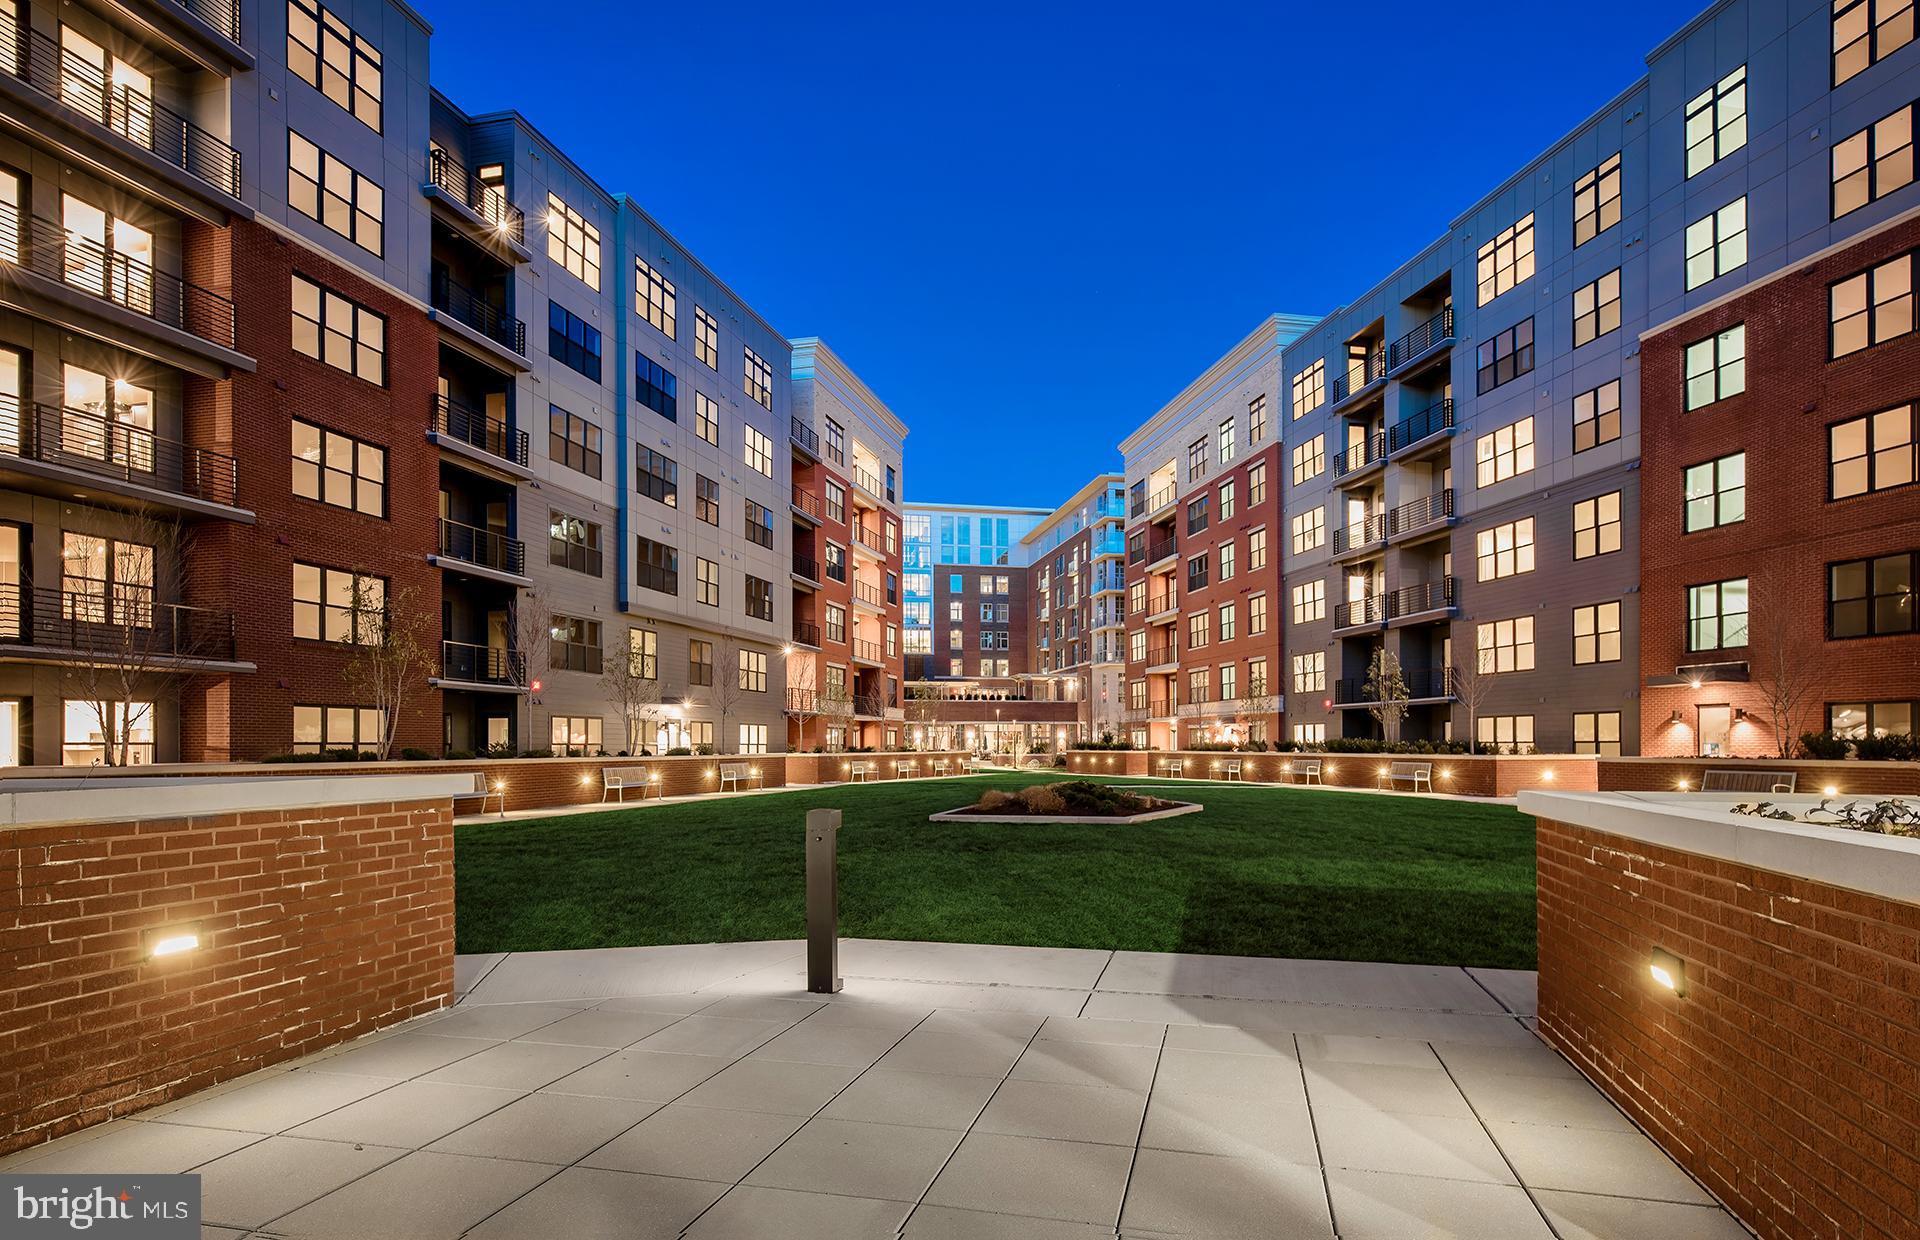 The 2.2B corner unit condo features 2-bedroom & 2-bath condo with 1,532 sq. ft. & includes a balcony